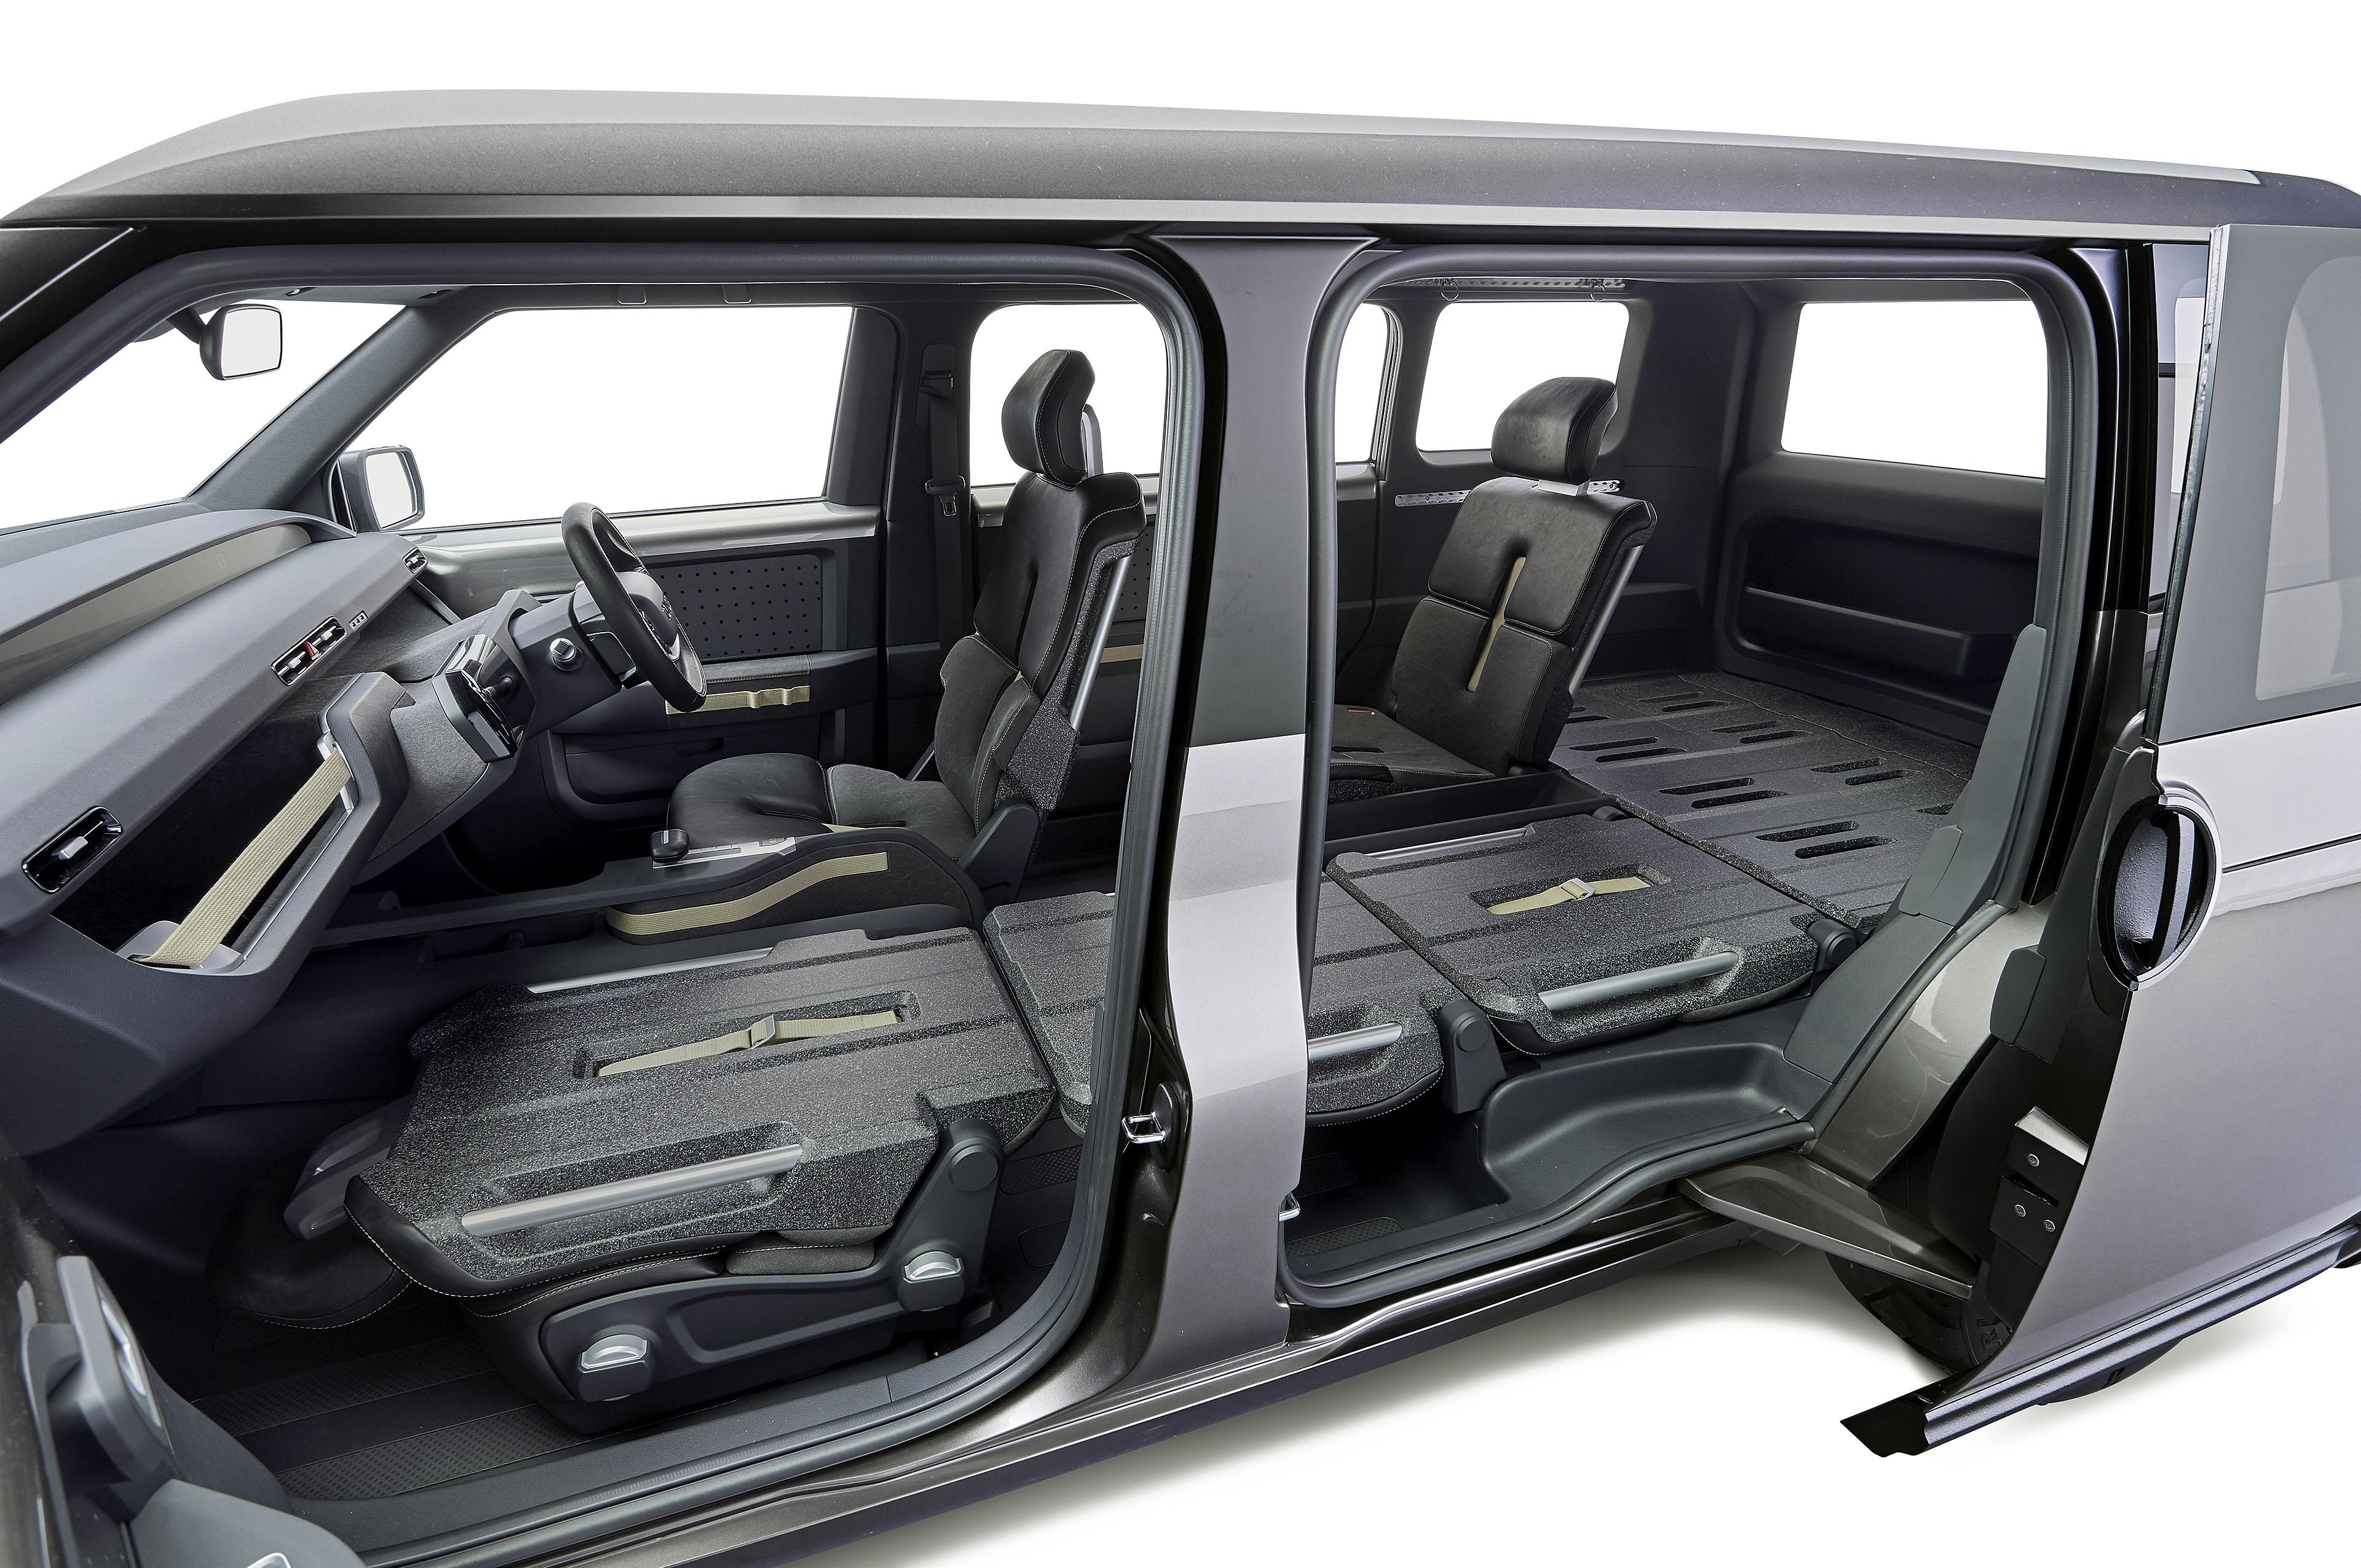 funky toyota tj cruiser is part van part suv automobile magazine. Black Bedroom Furniture Sets. Home Design Ideas